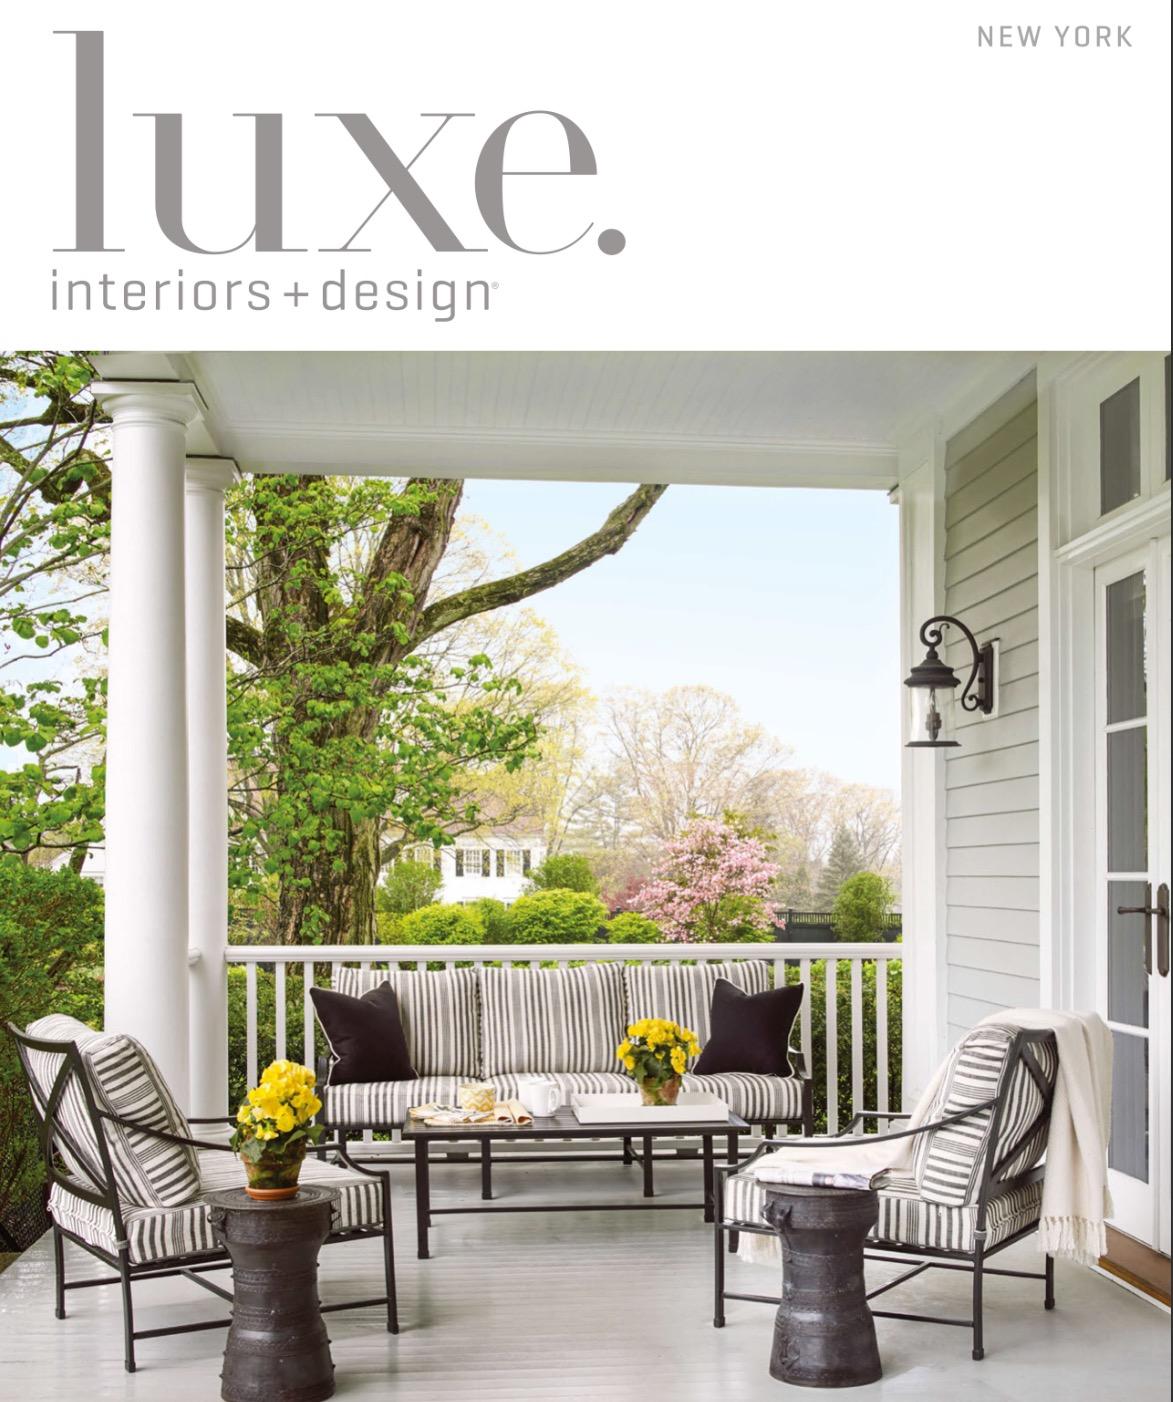 Luxe interiors design stewart schafer for Luxe furniture and design